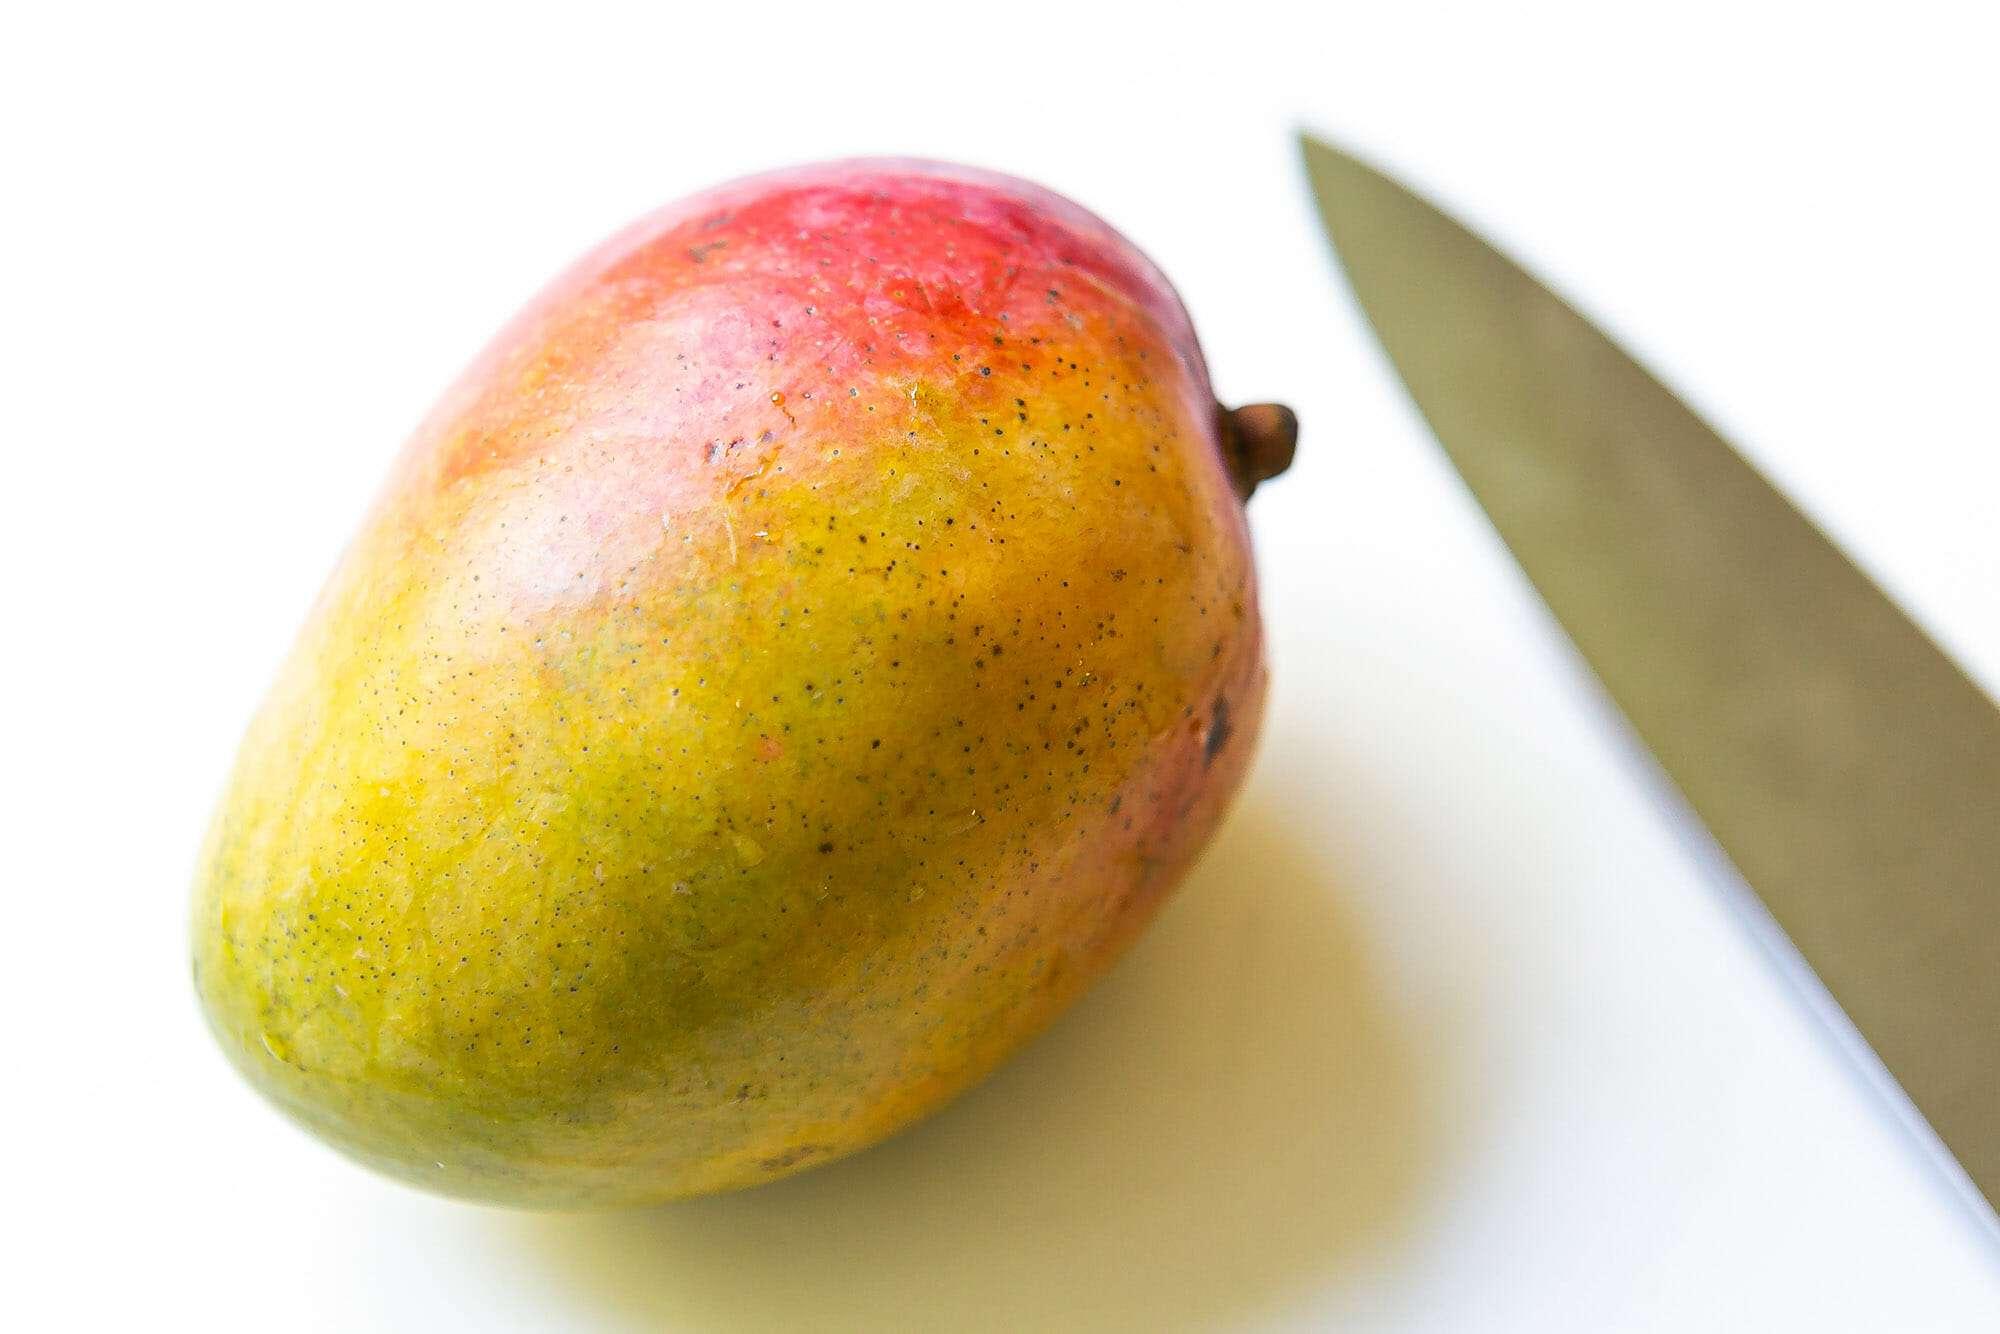 Ripe mango on a cutting board with a knife